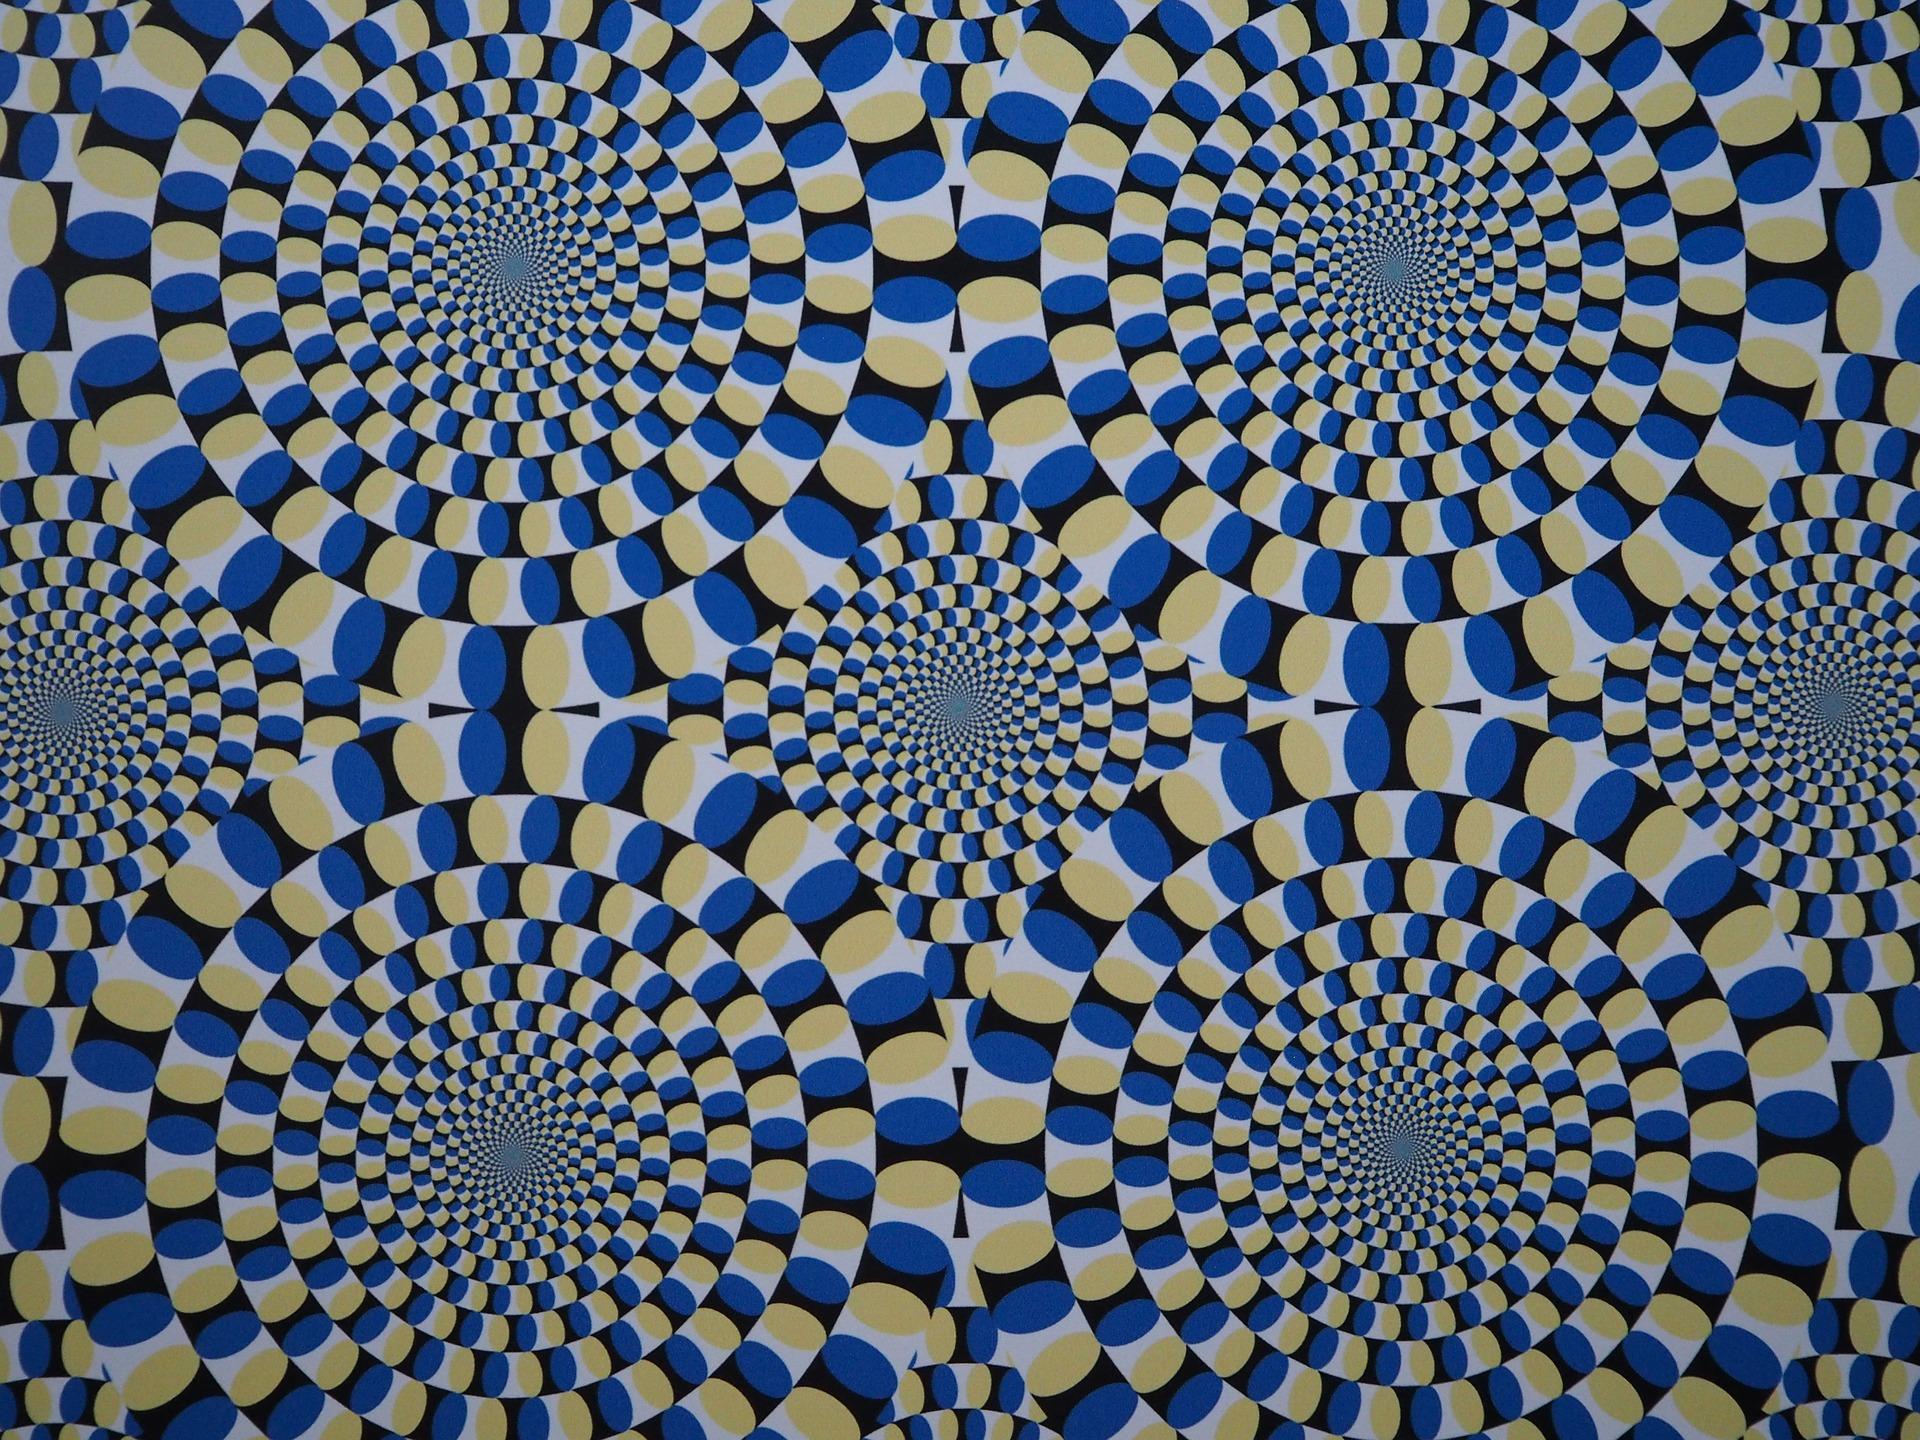 pattern-2644564_1920_c_ratfink1973_pixabay